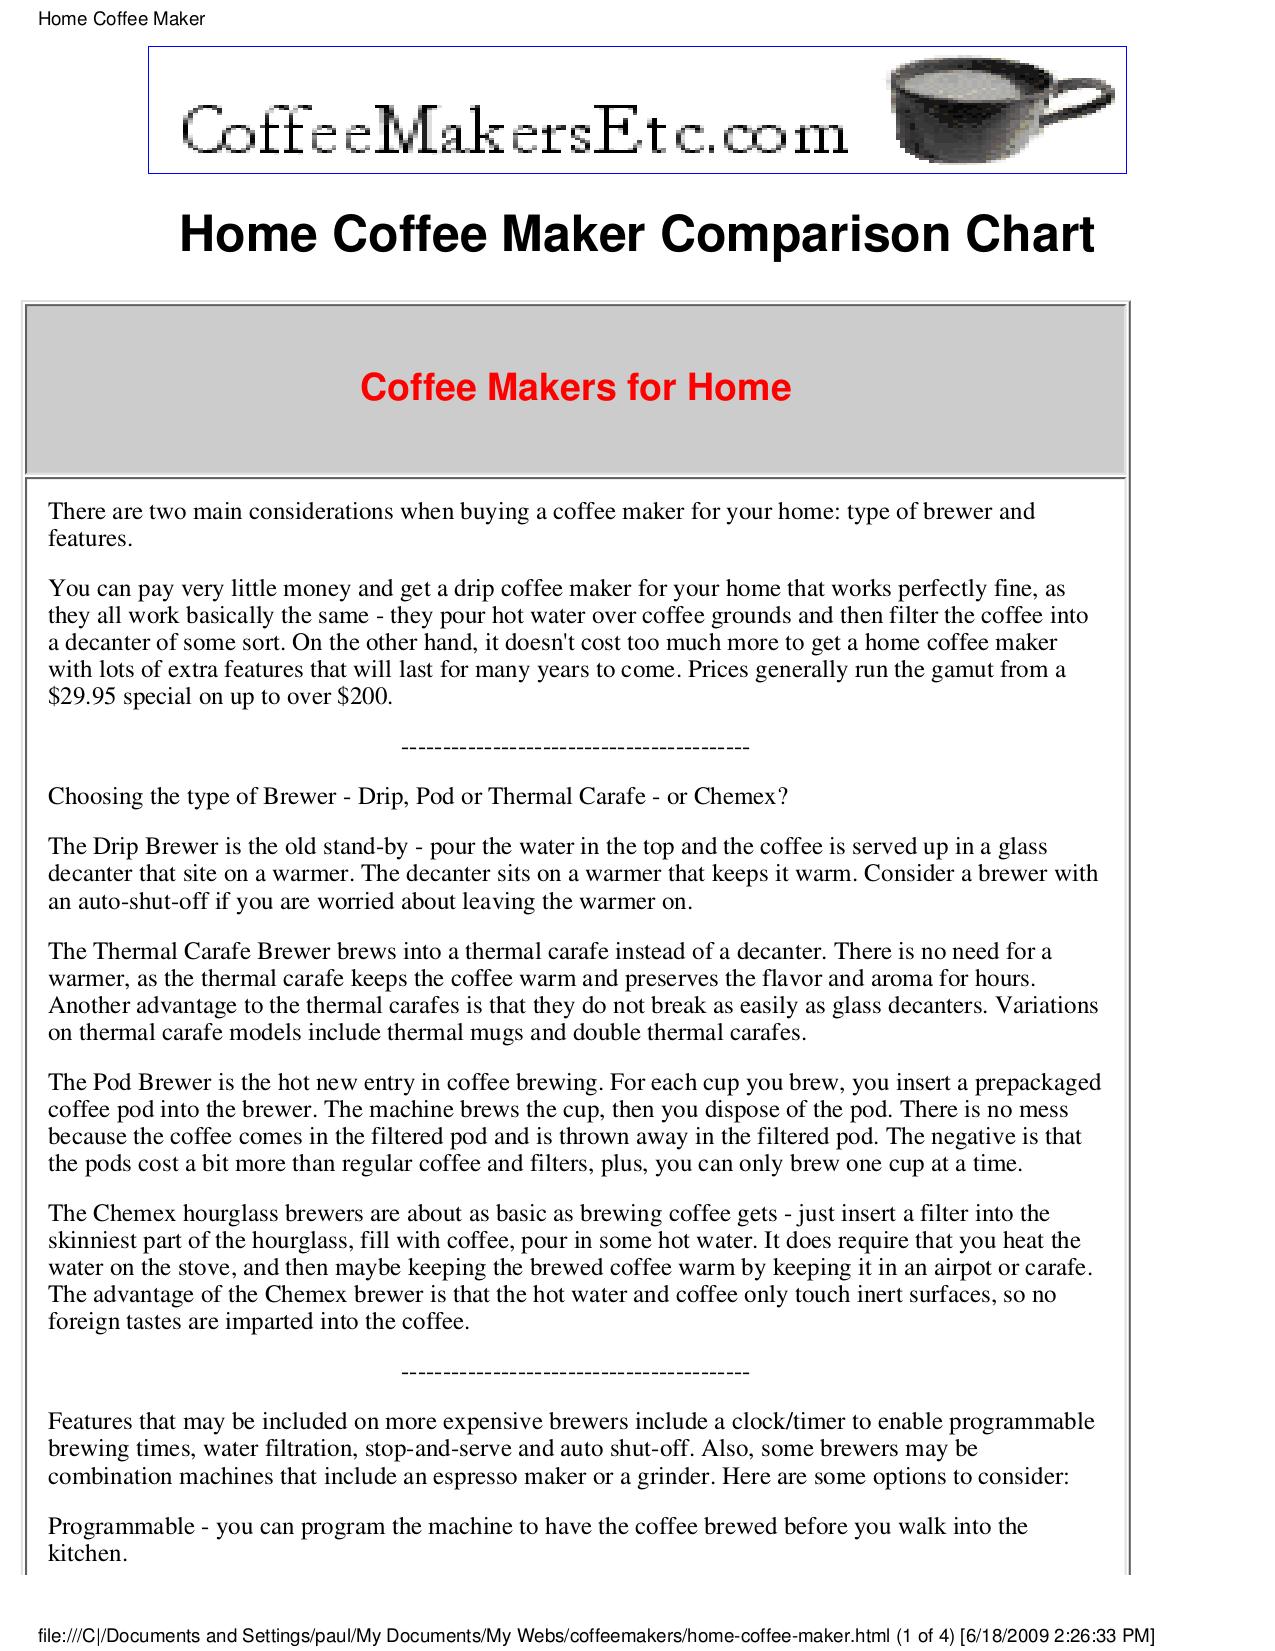 pdf for Krups Coffee Maker KM7000 manual